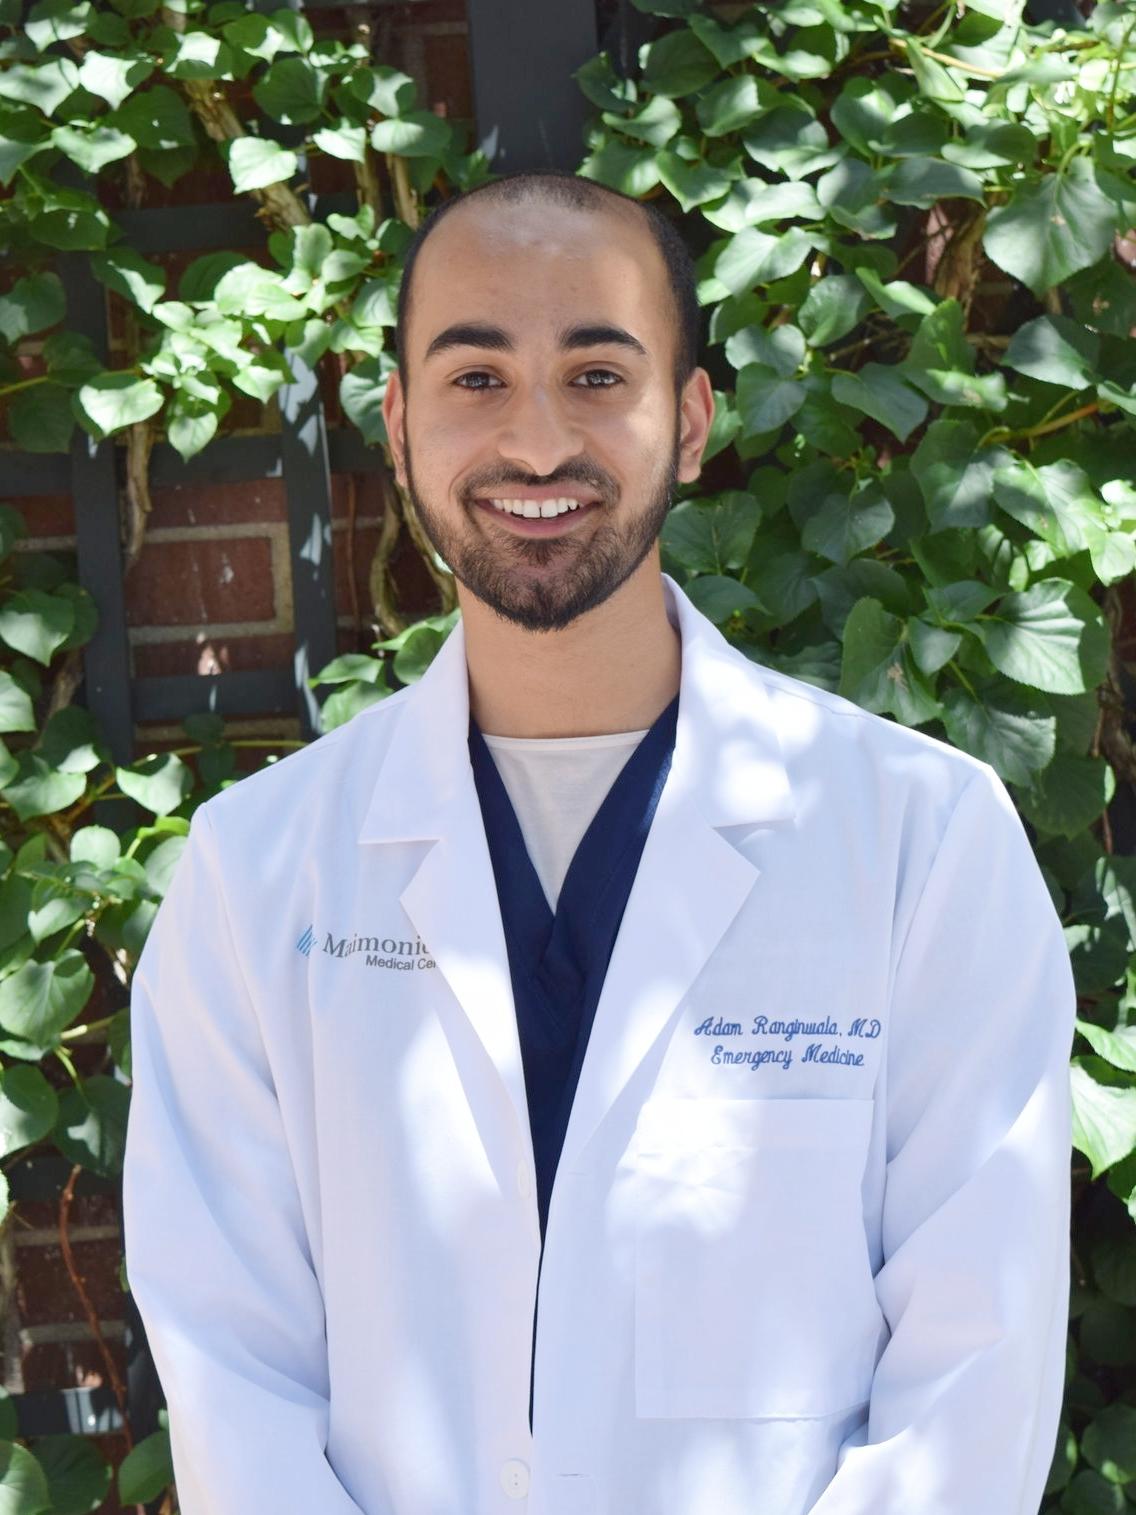 Class of 2021 — Maimonides Emergency Medicine Residency